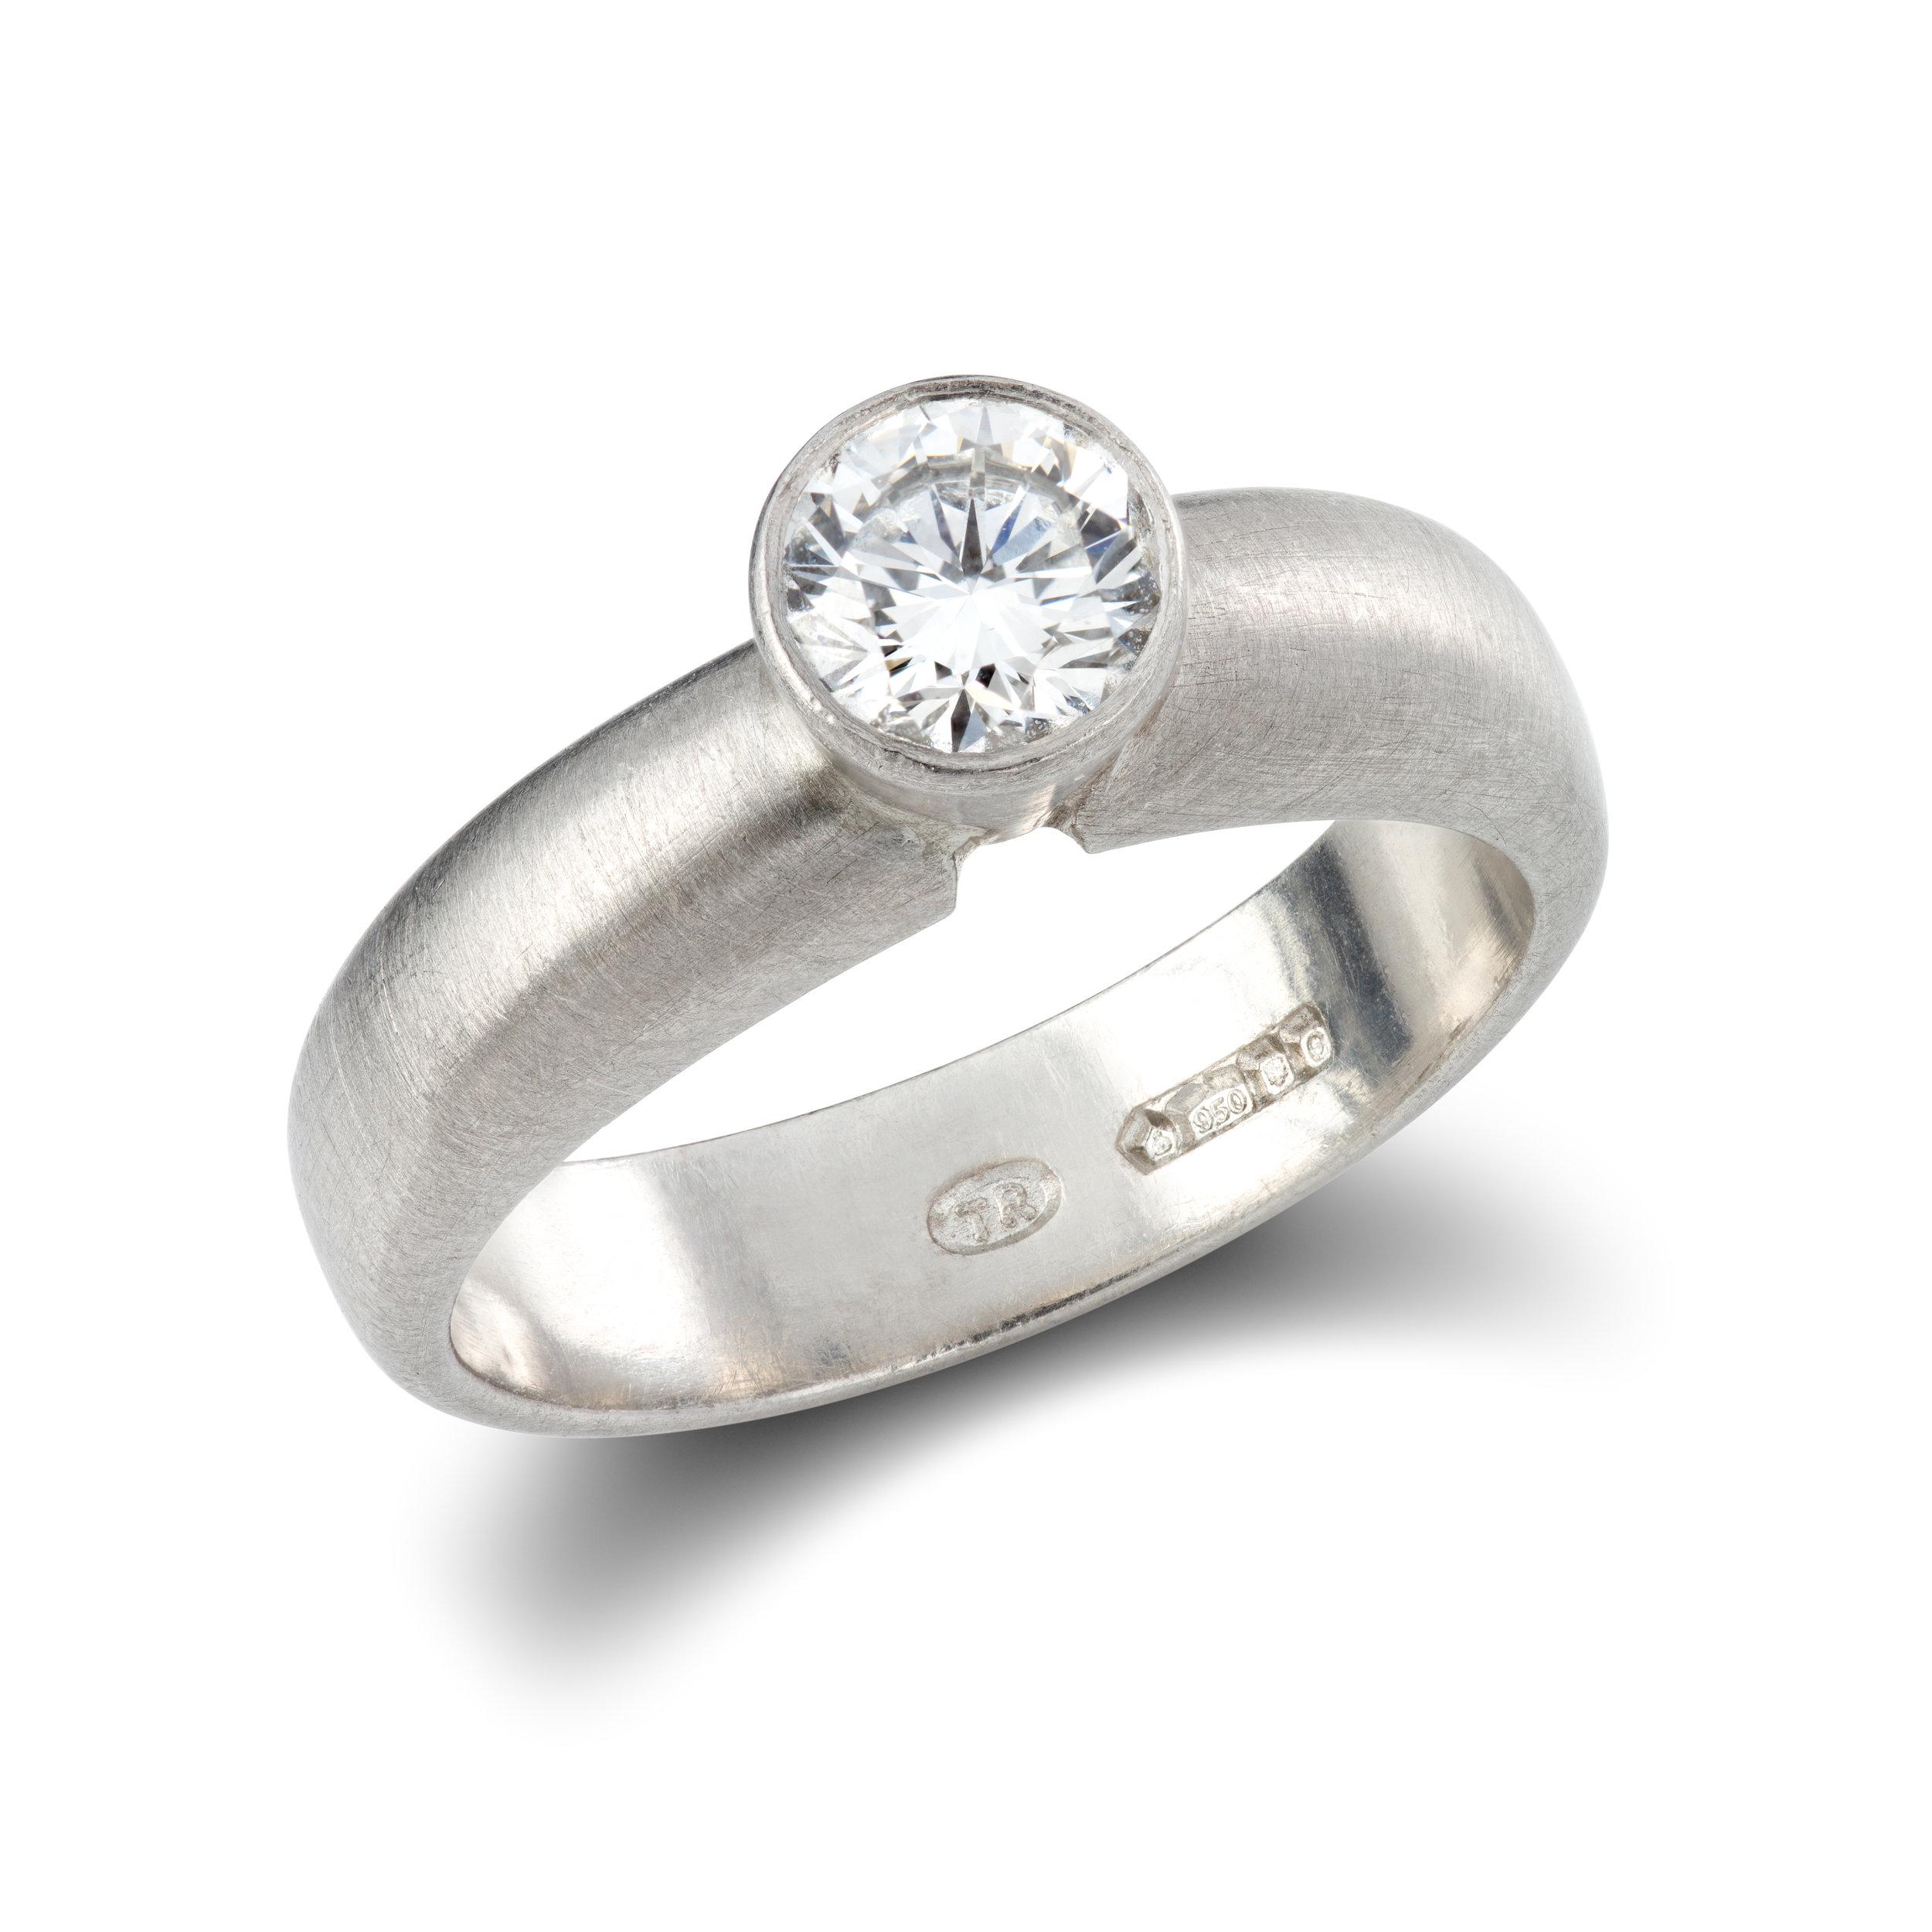 Platinum engagement ring set with one round brilliant cut diamond - £3,859